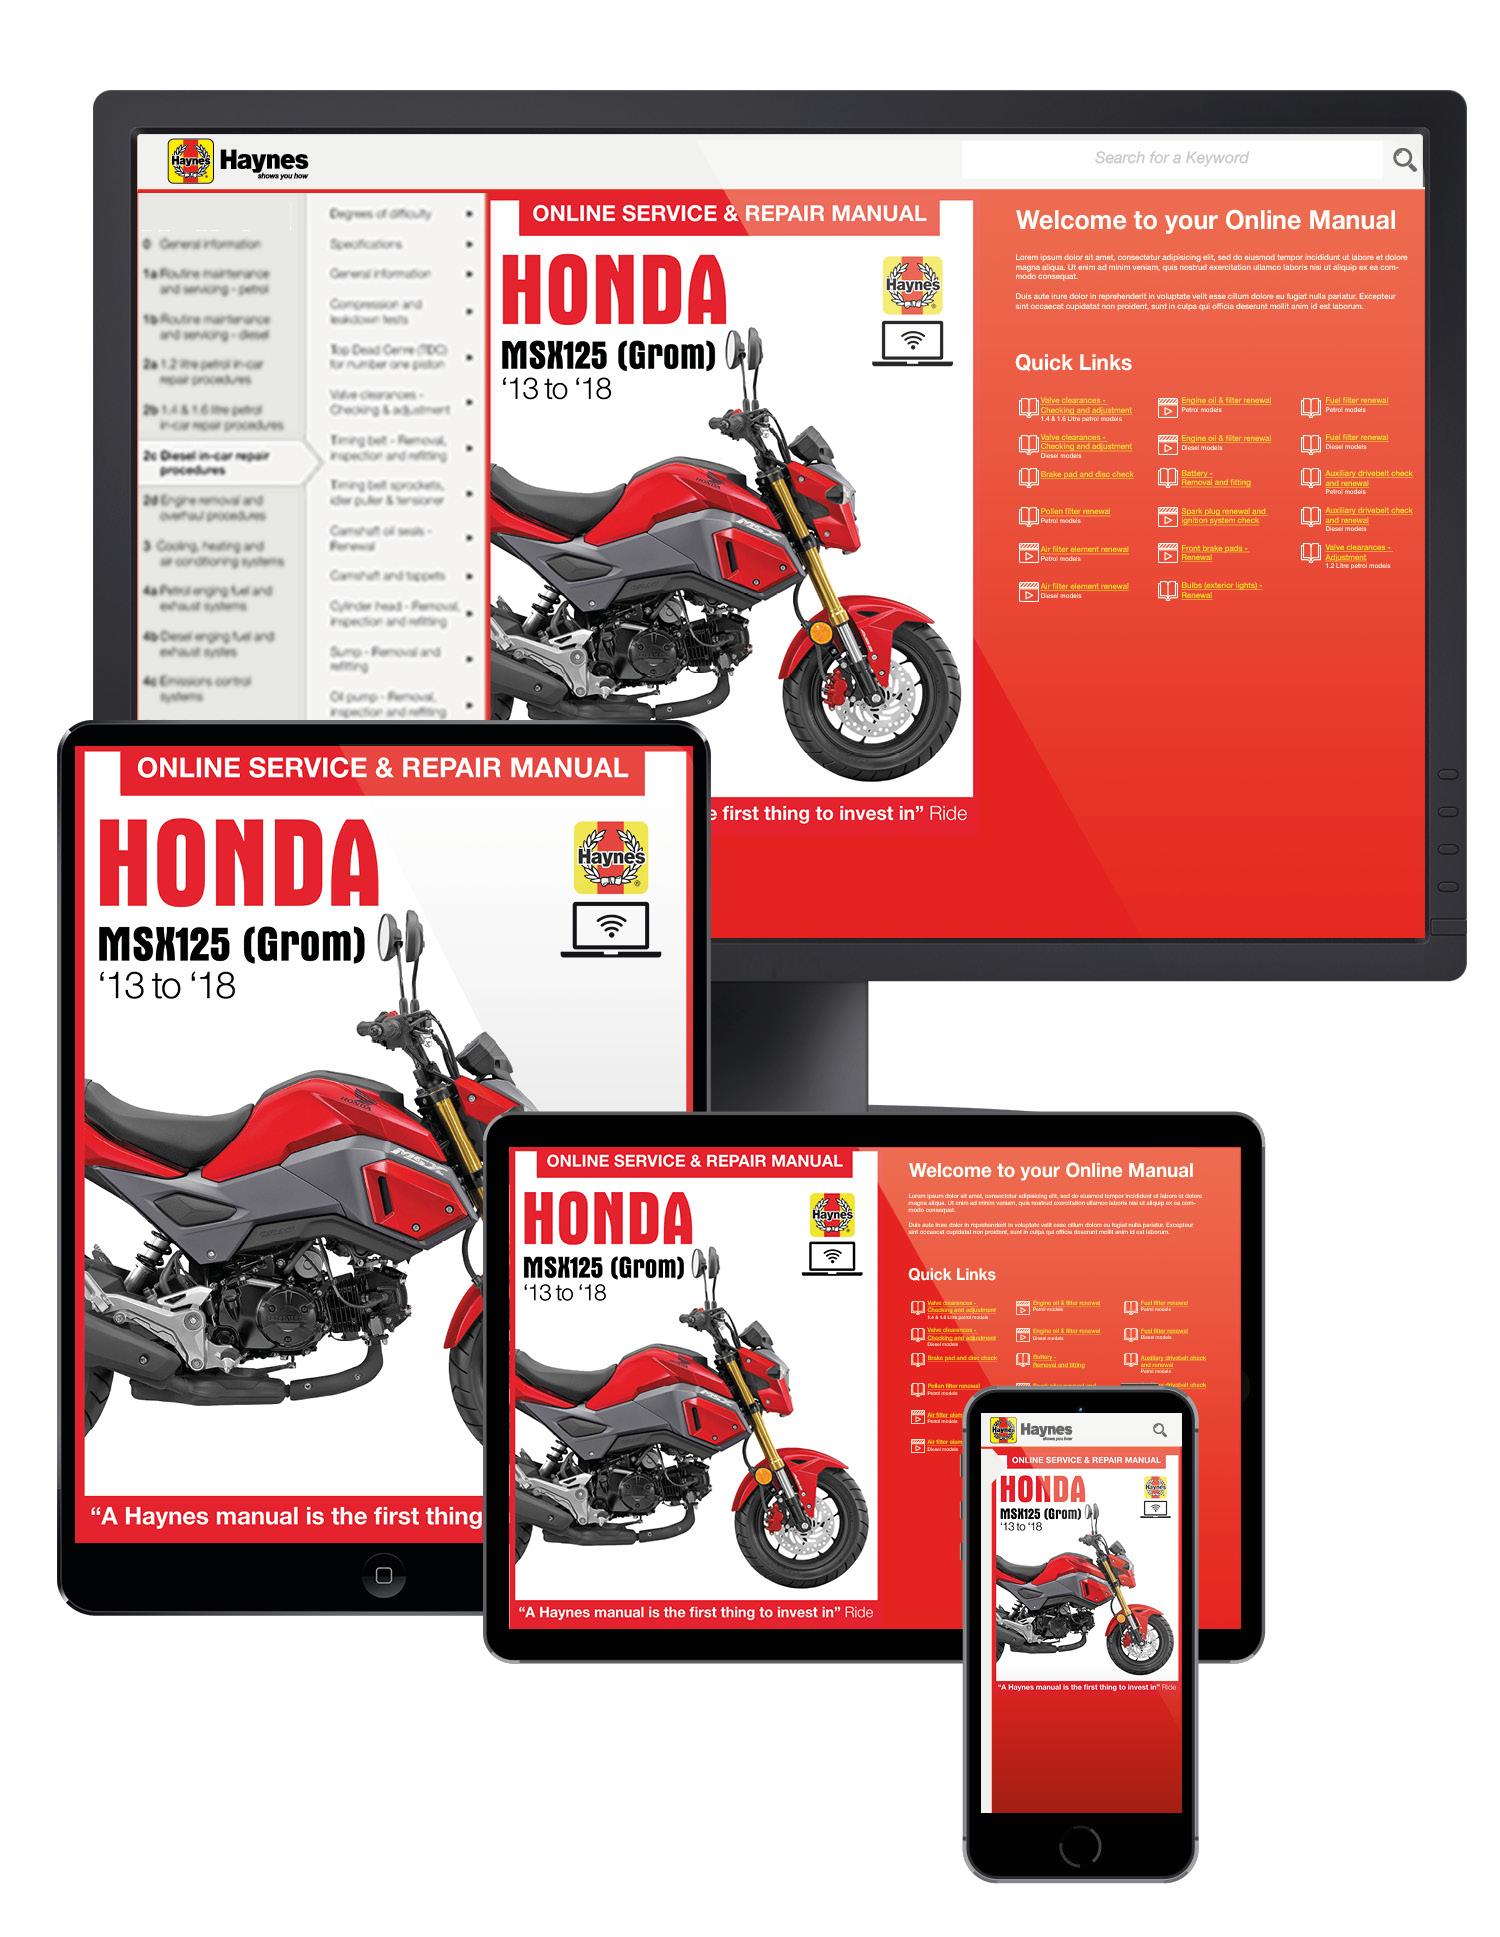 Honda MSX125 (Grom) (13 - 18) Haynes Online Manual